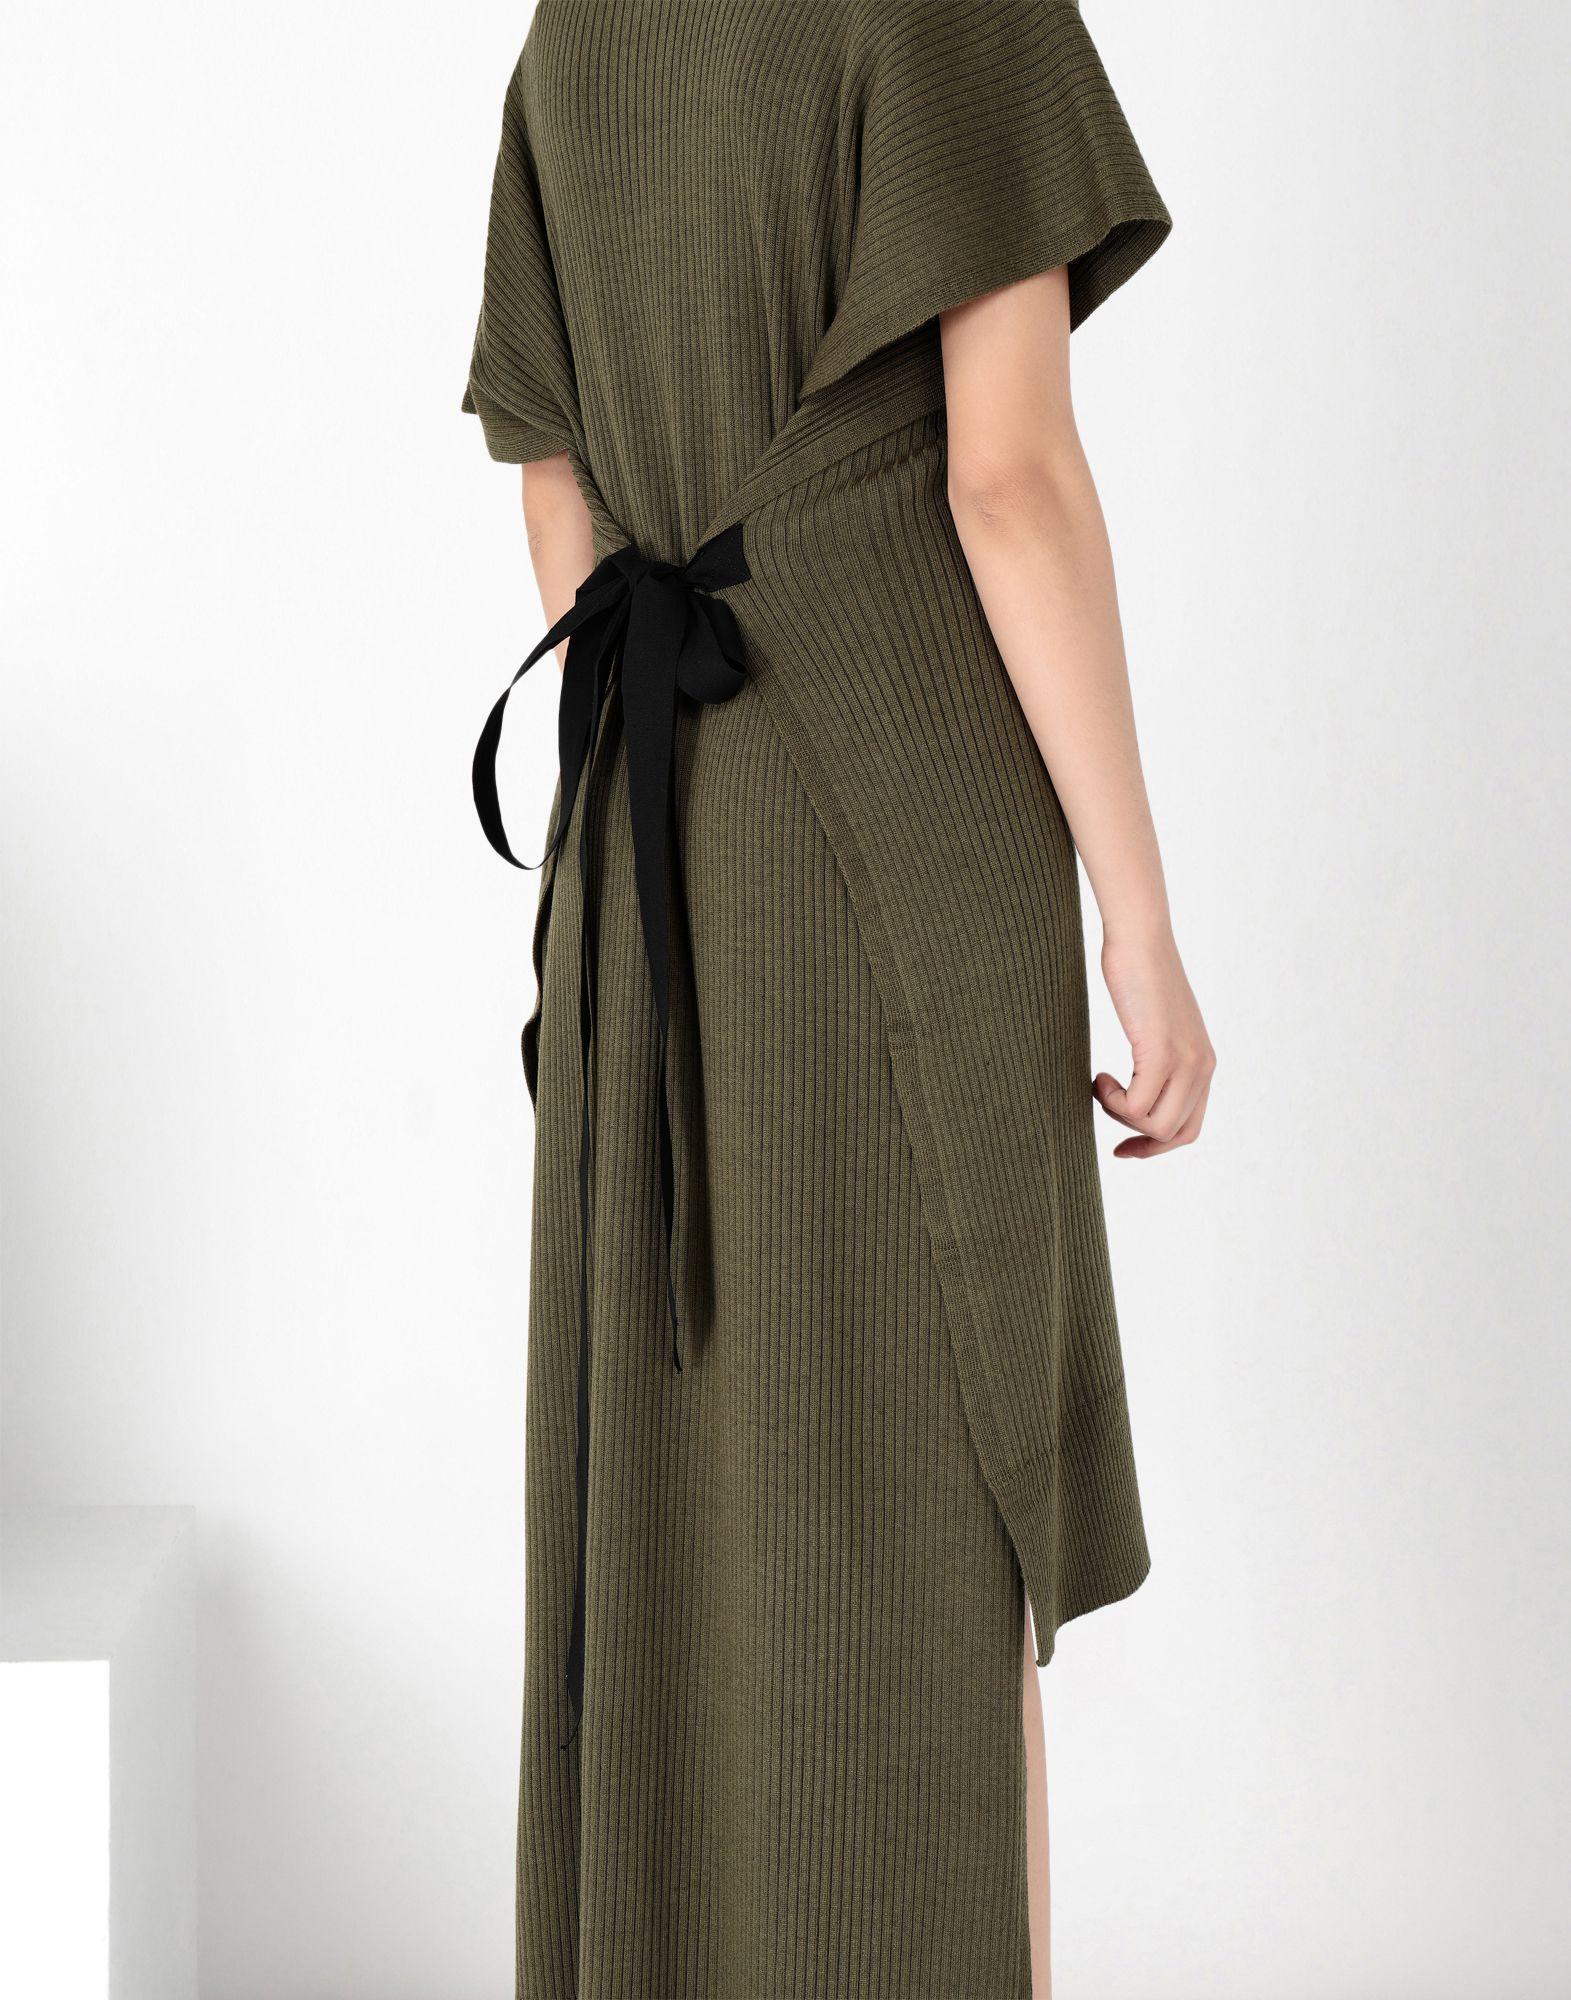 MM6 MAISON MARGIELA Knitwear polo neck dress Long dress Woman e